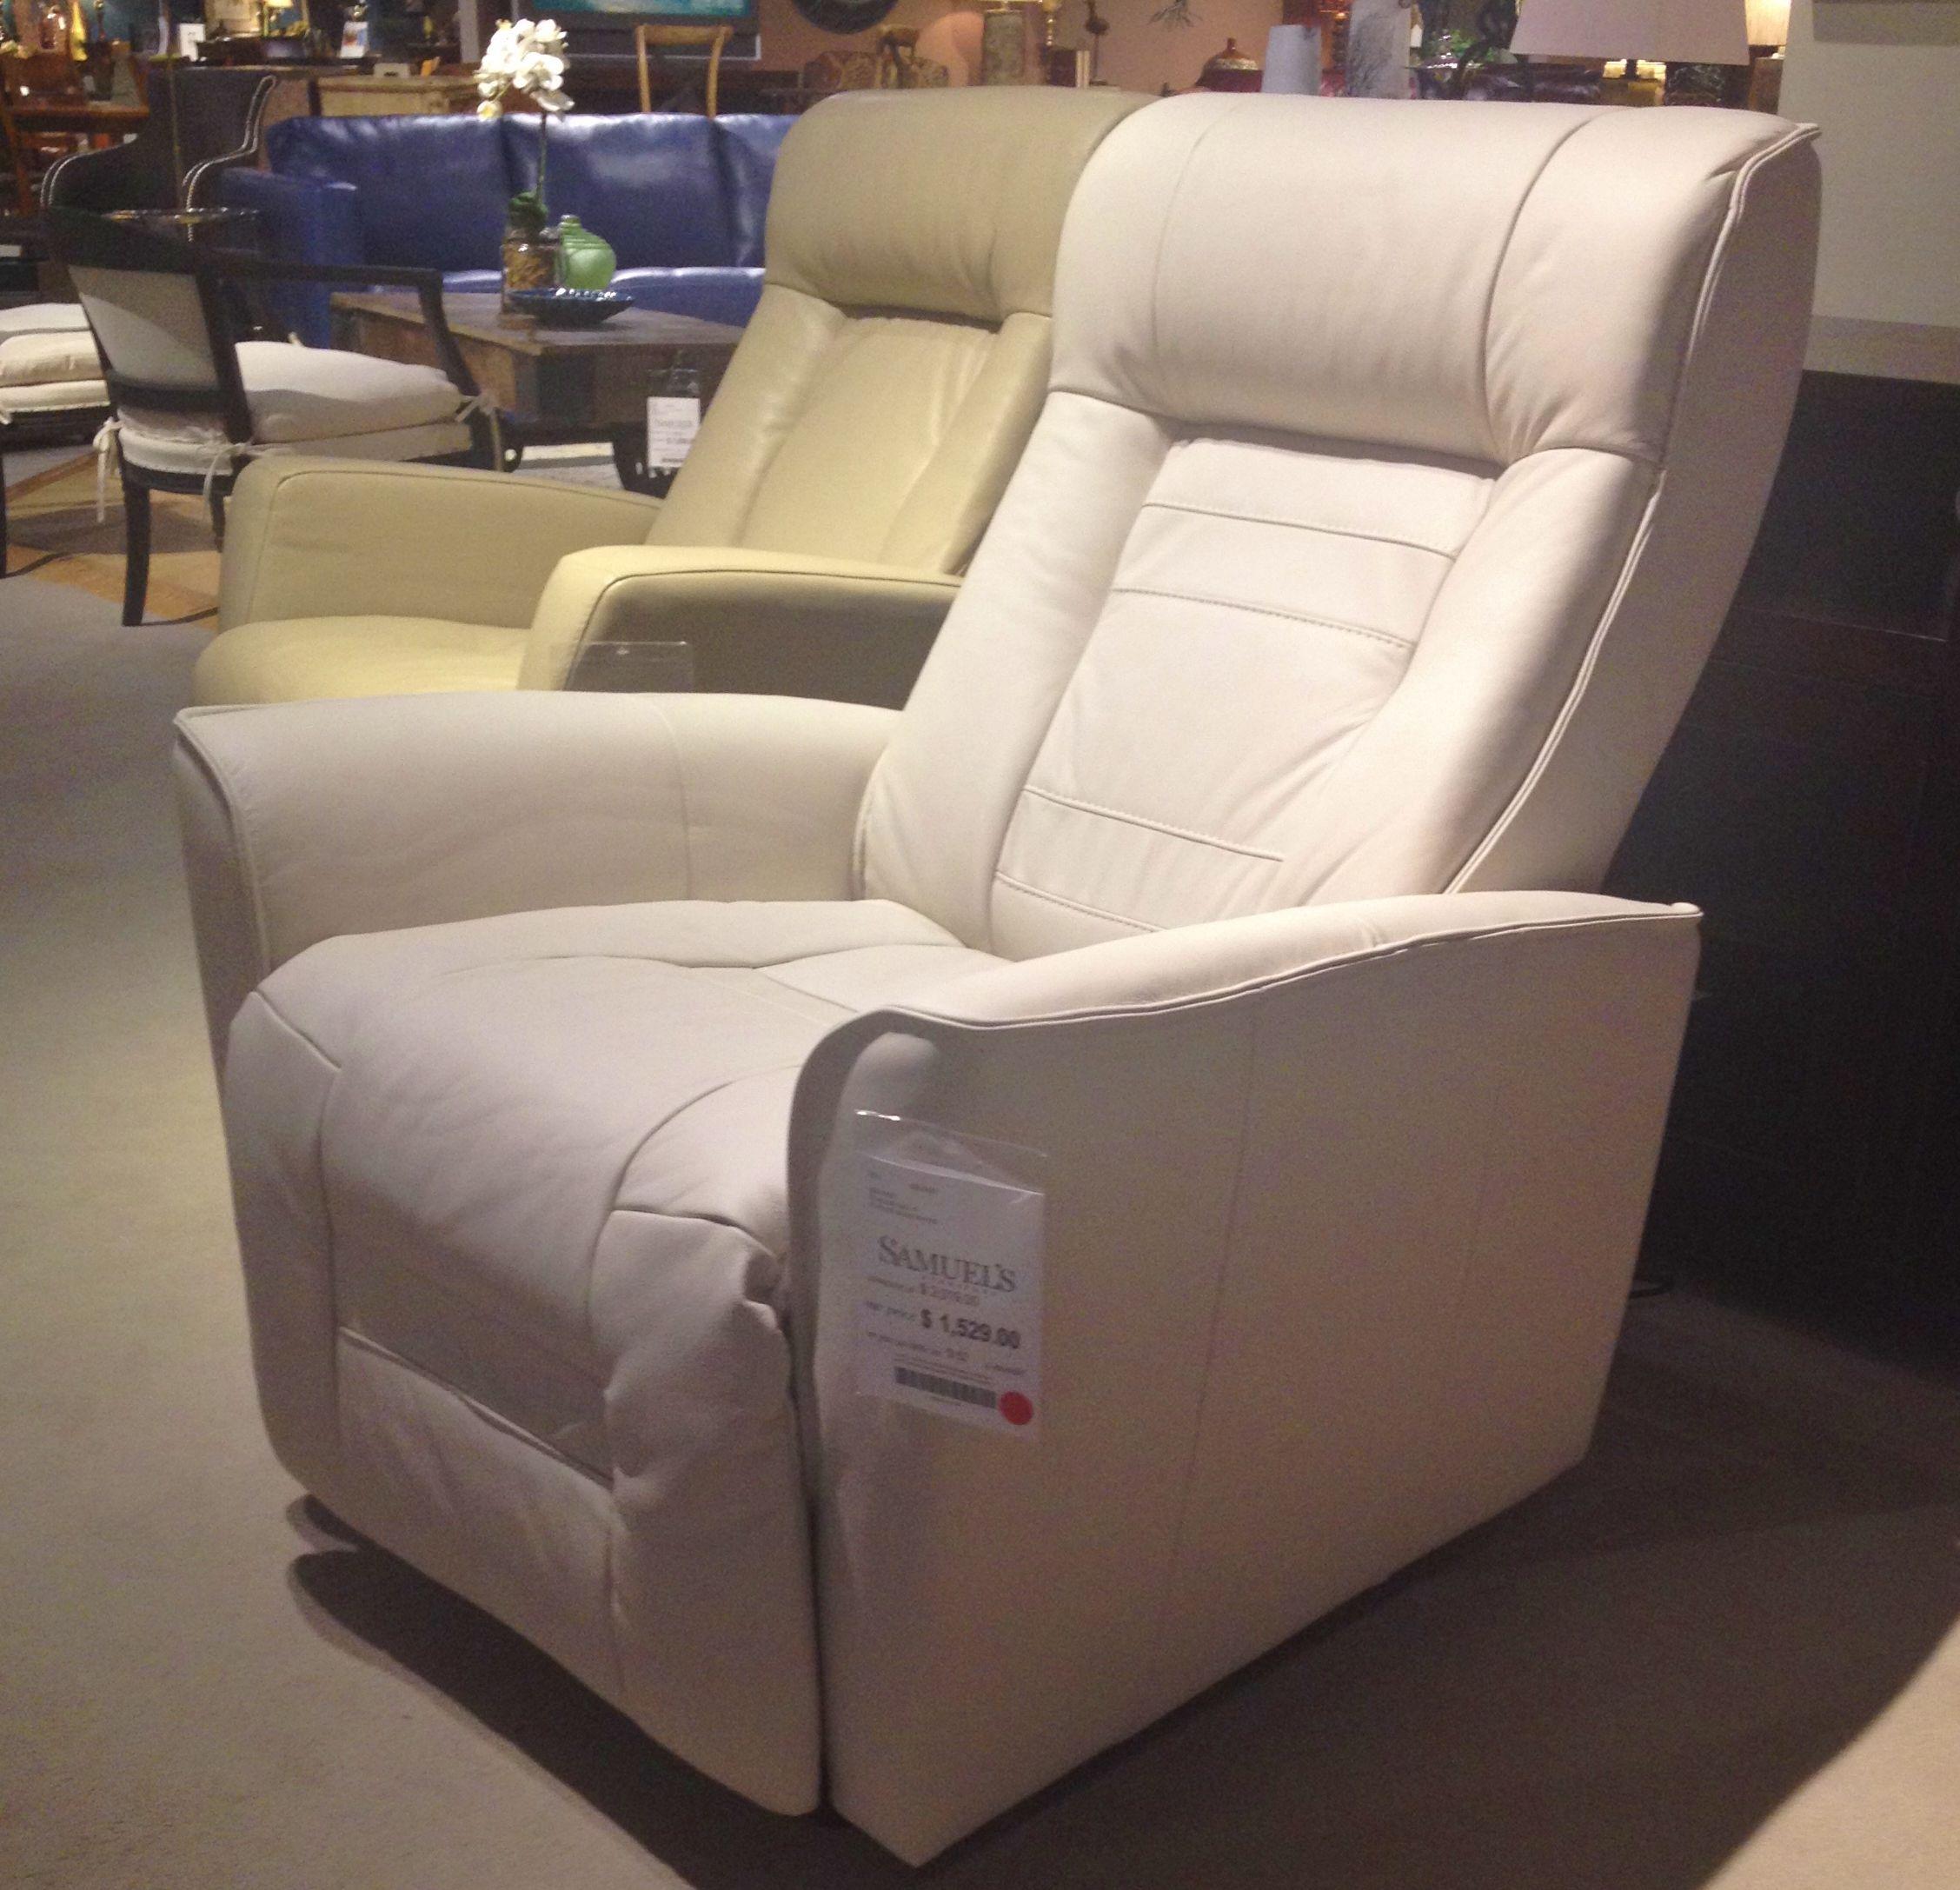 Palliser recliner. Multiple styles to choose from